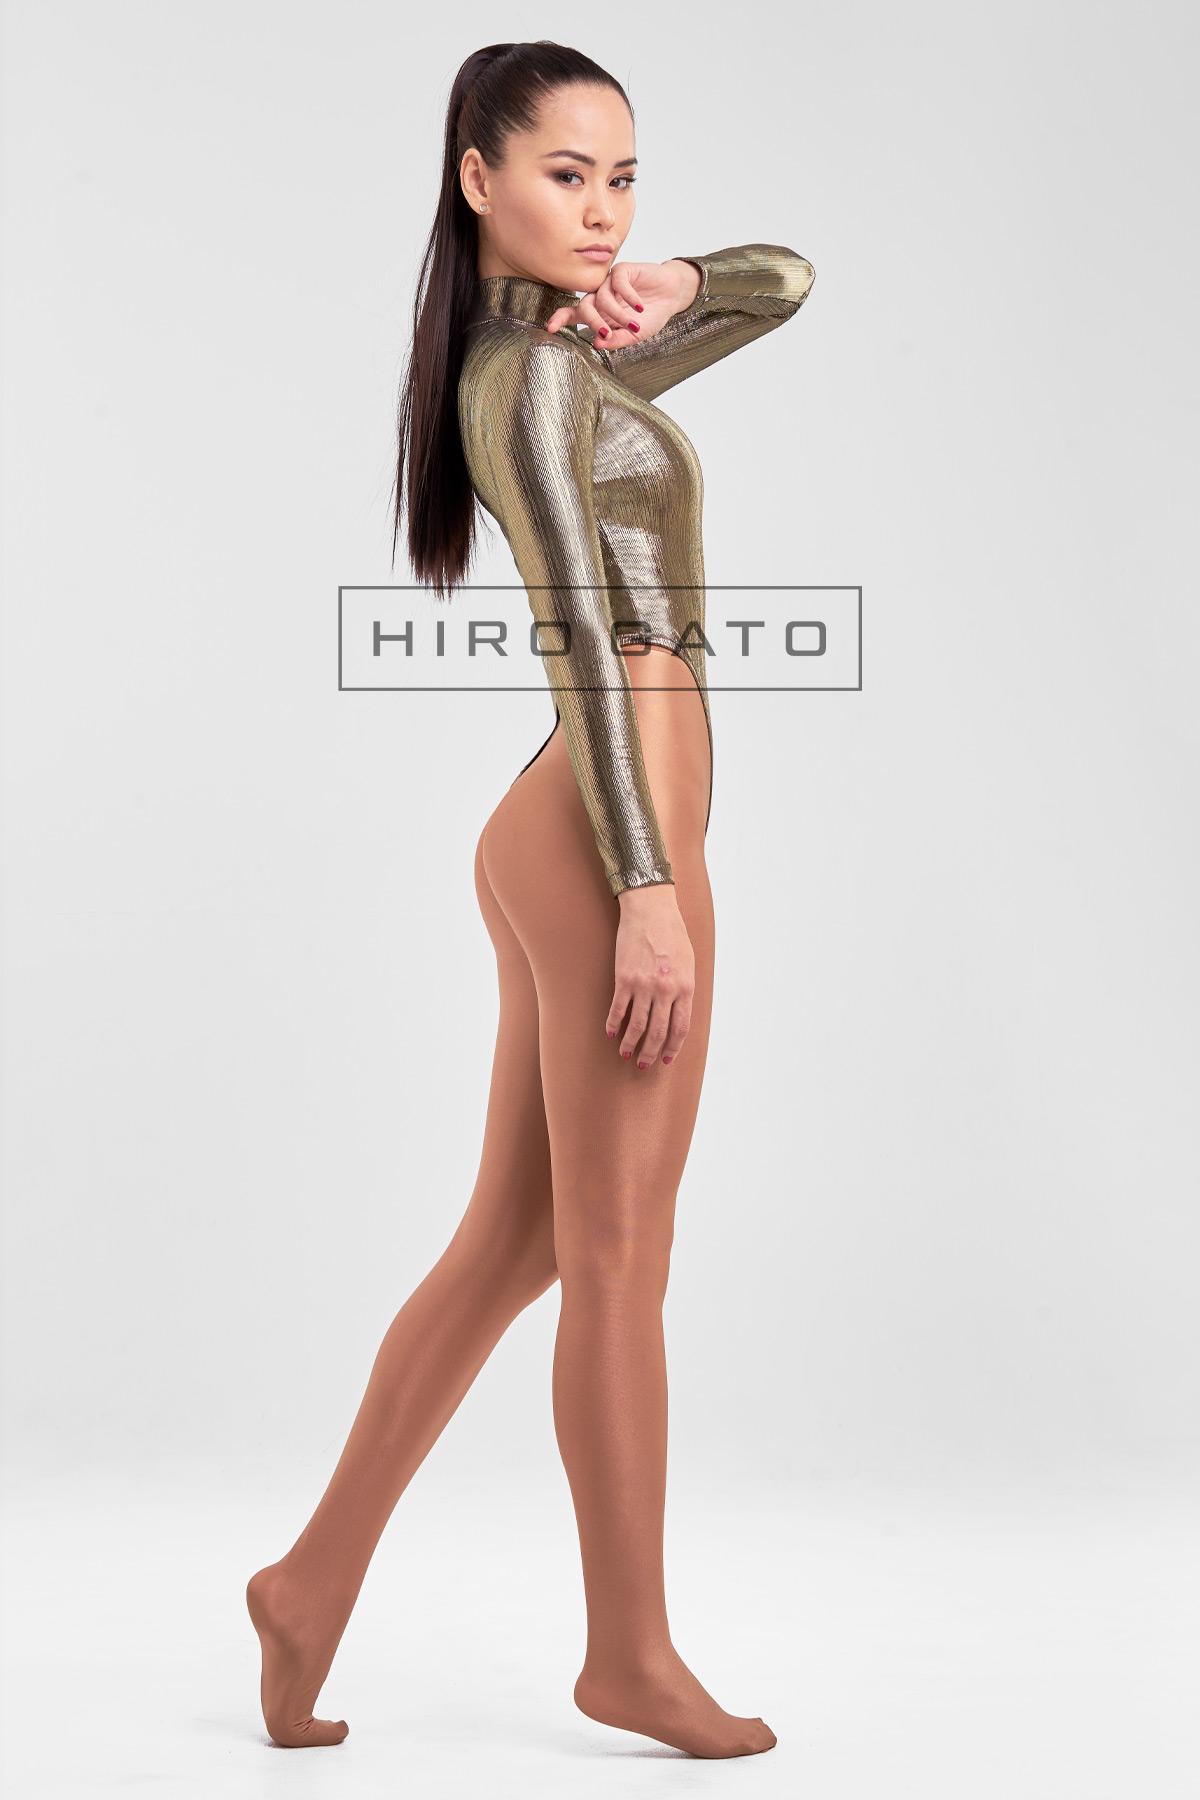 Shiny Spandex Lycra High Leg Cut Leotard Light Gold